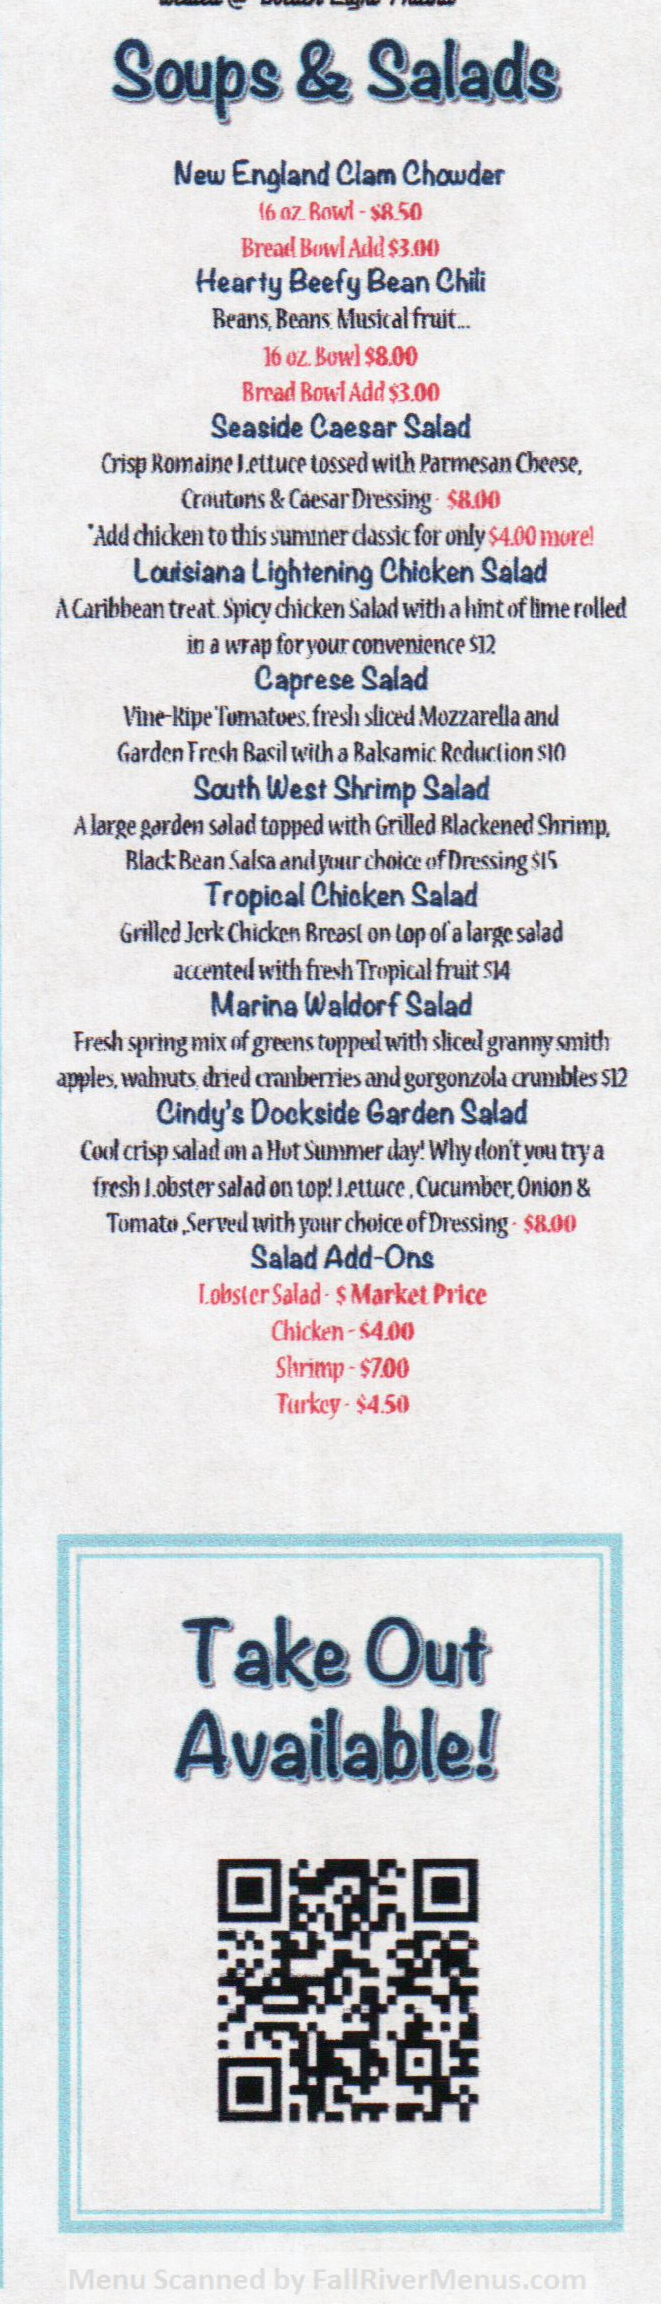 tipsy seagull menu 3 scnd 7-1-2016